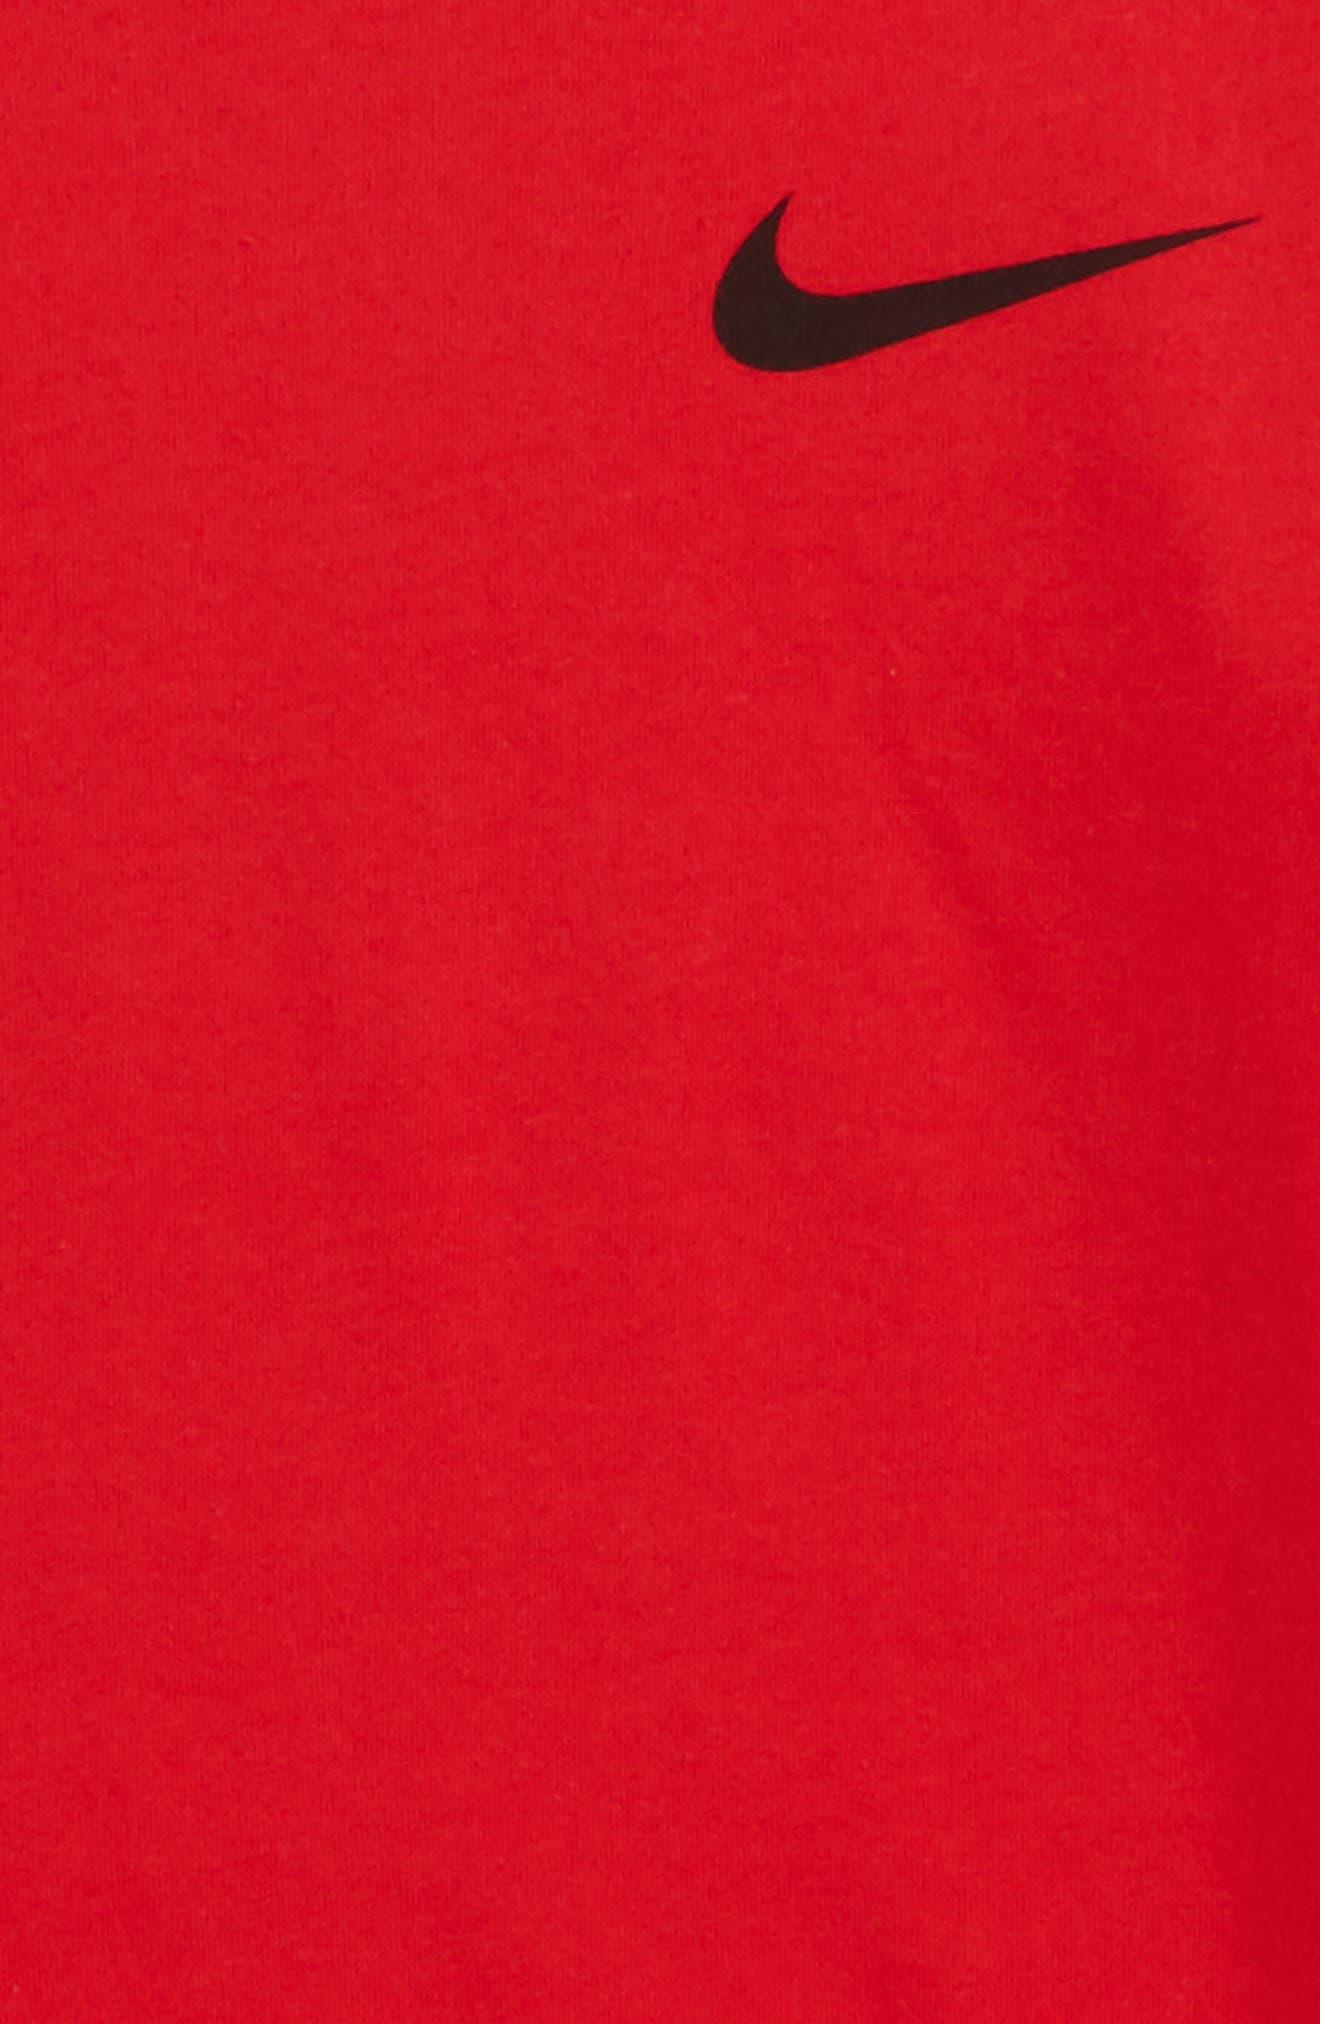 Dry Elite Long Sleeve T-Shirt,                             Alternate thumbnail 8, color,